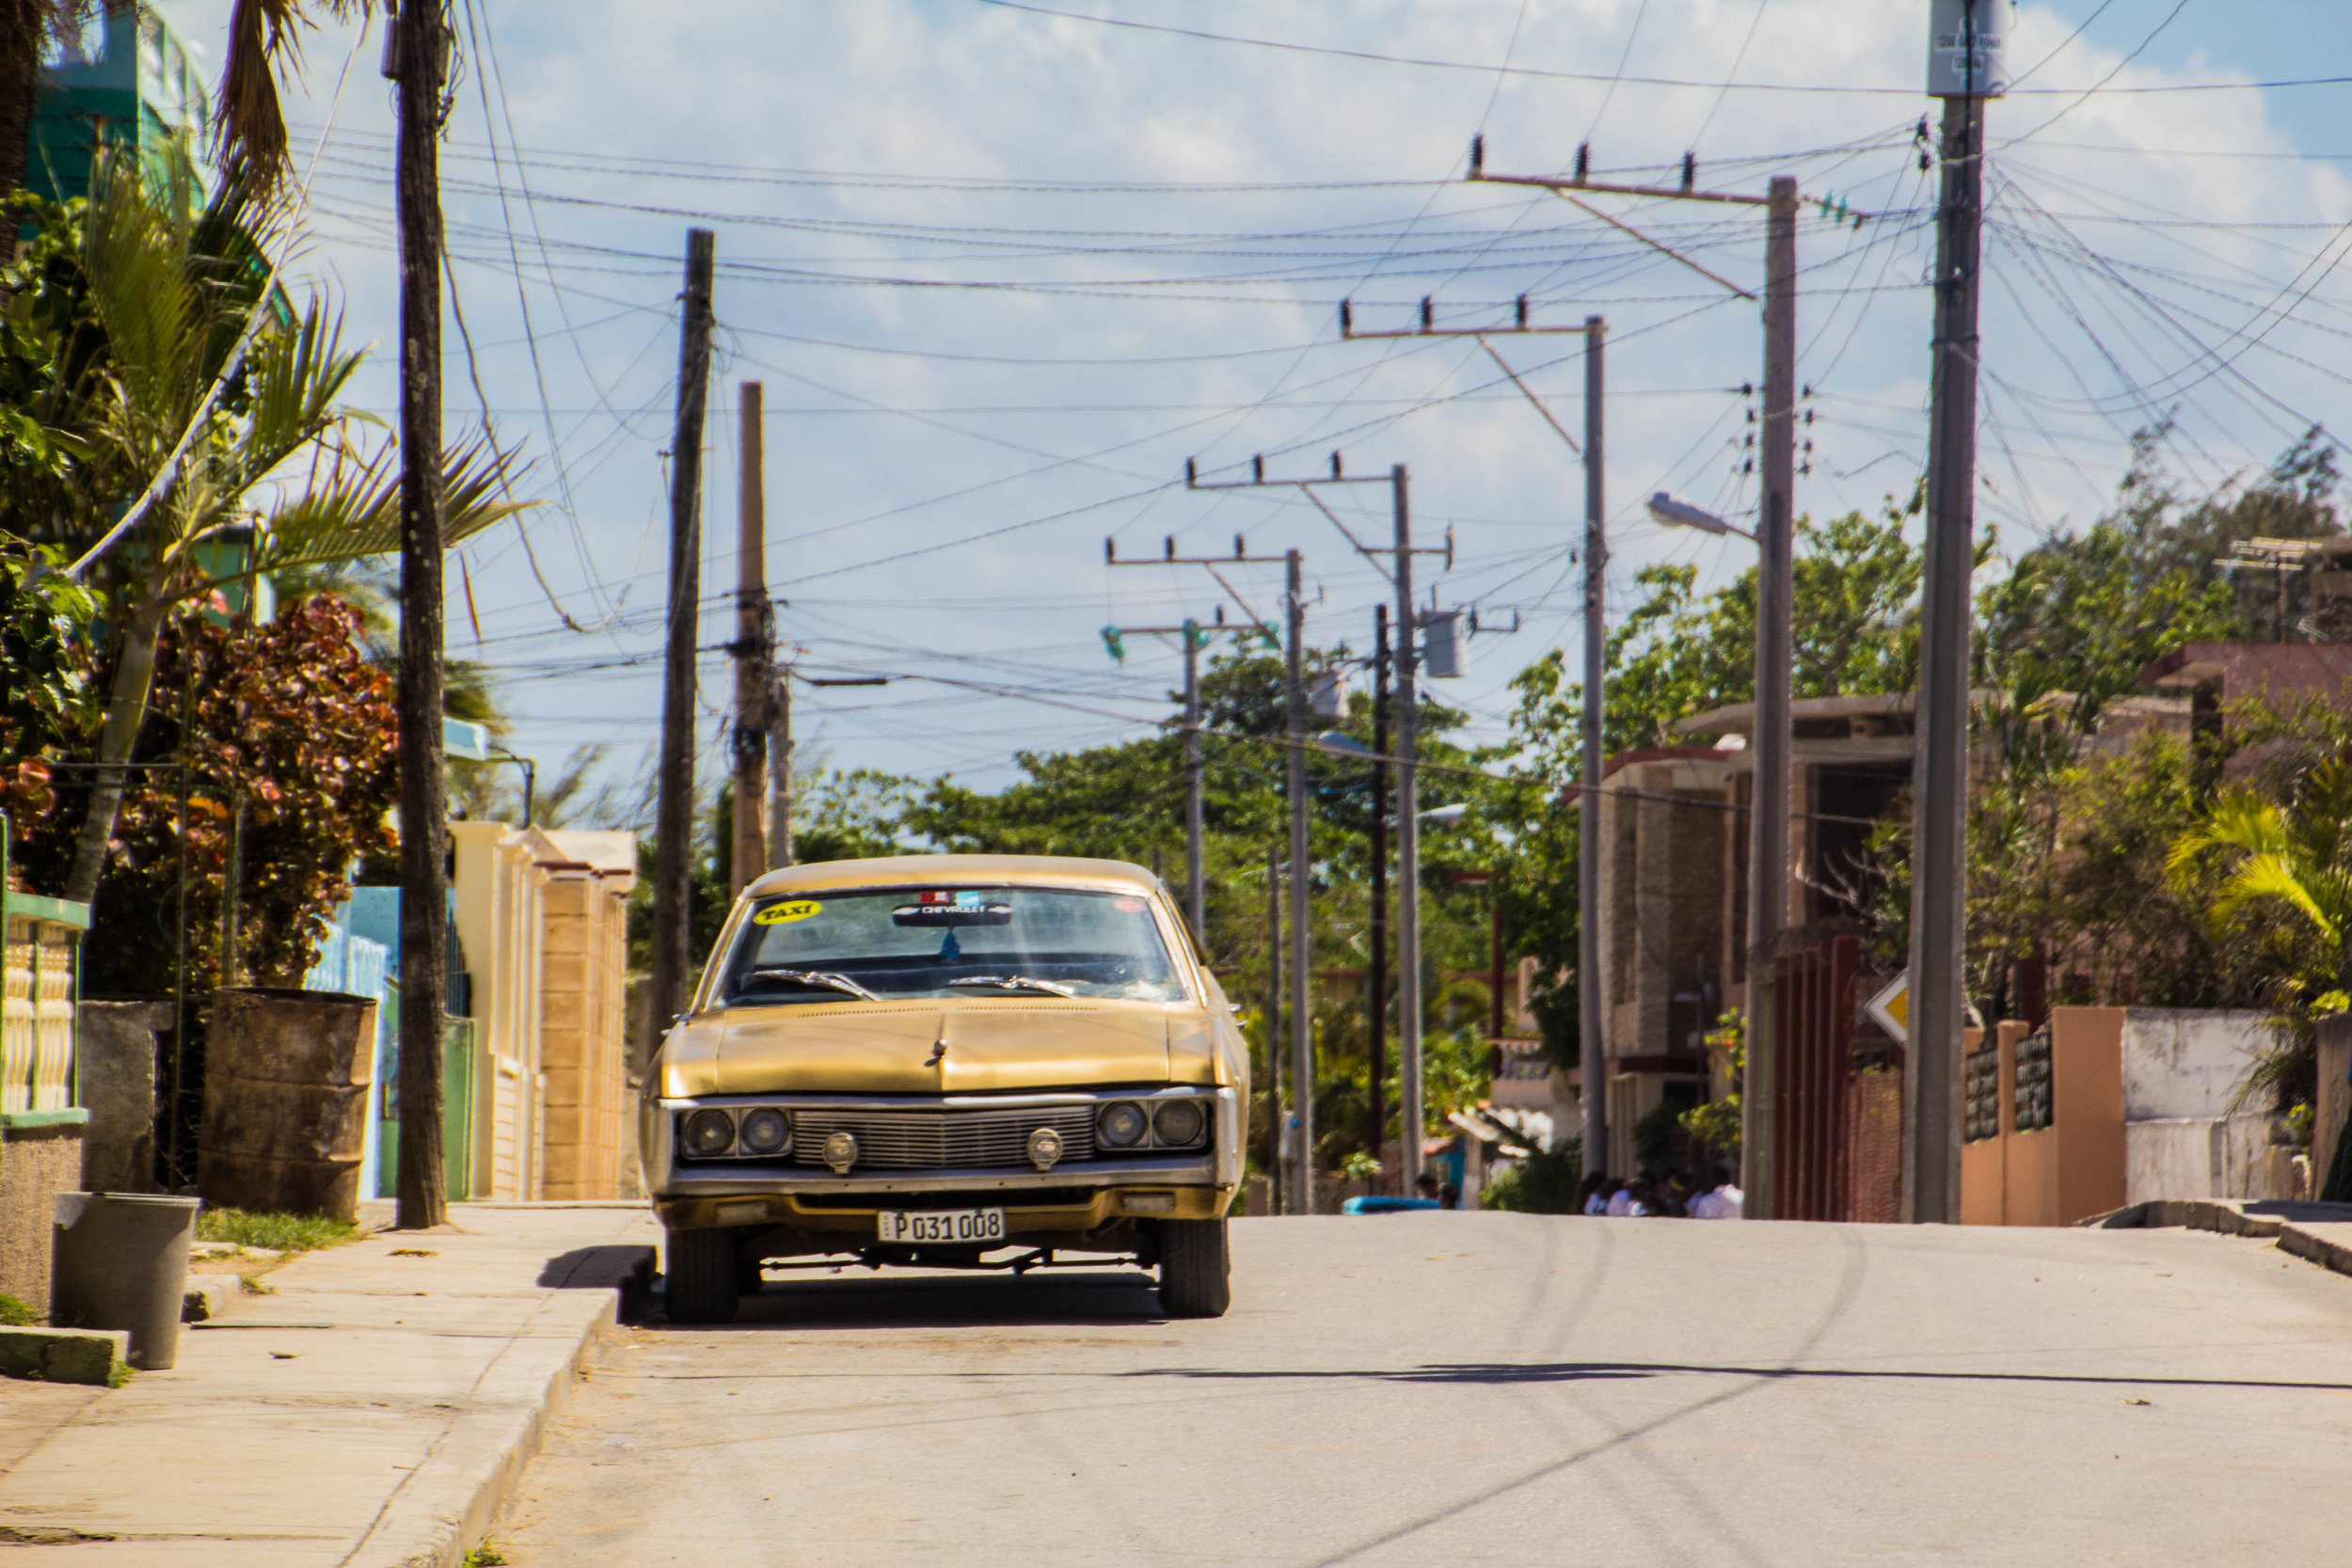 boca de camarioca cuba streets-1-2.jpg